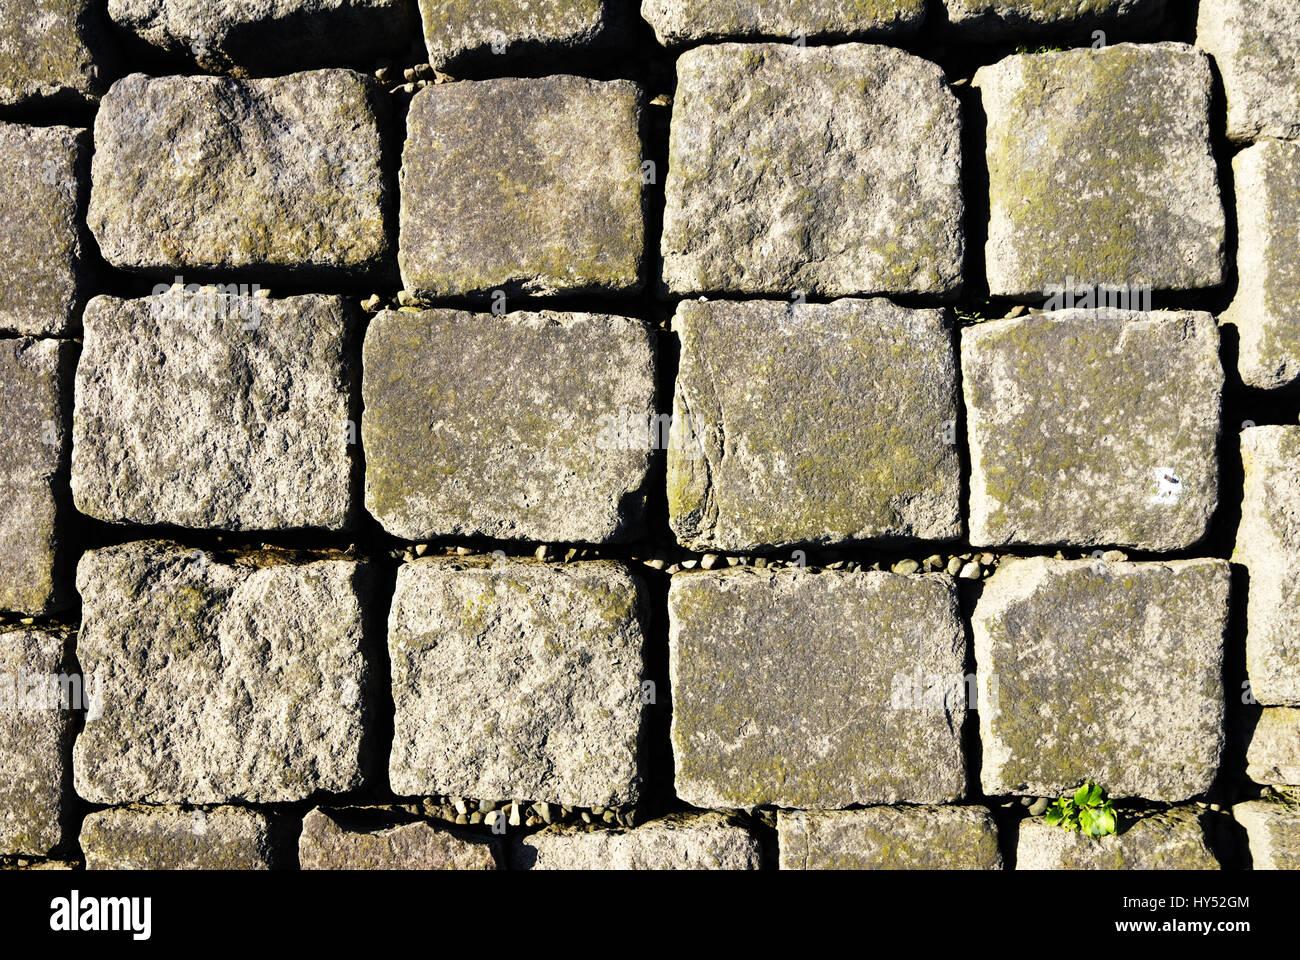 Stones on a stack in the Elbufer in the 4 and march landing, Hamburg, Germany, Steine auf einem Stack am Elbufer Stock Photo